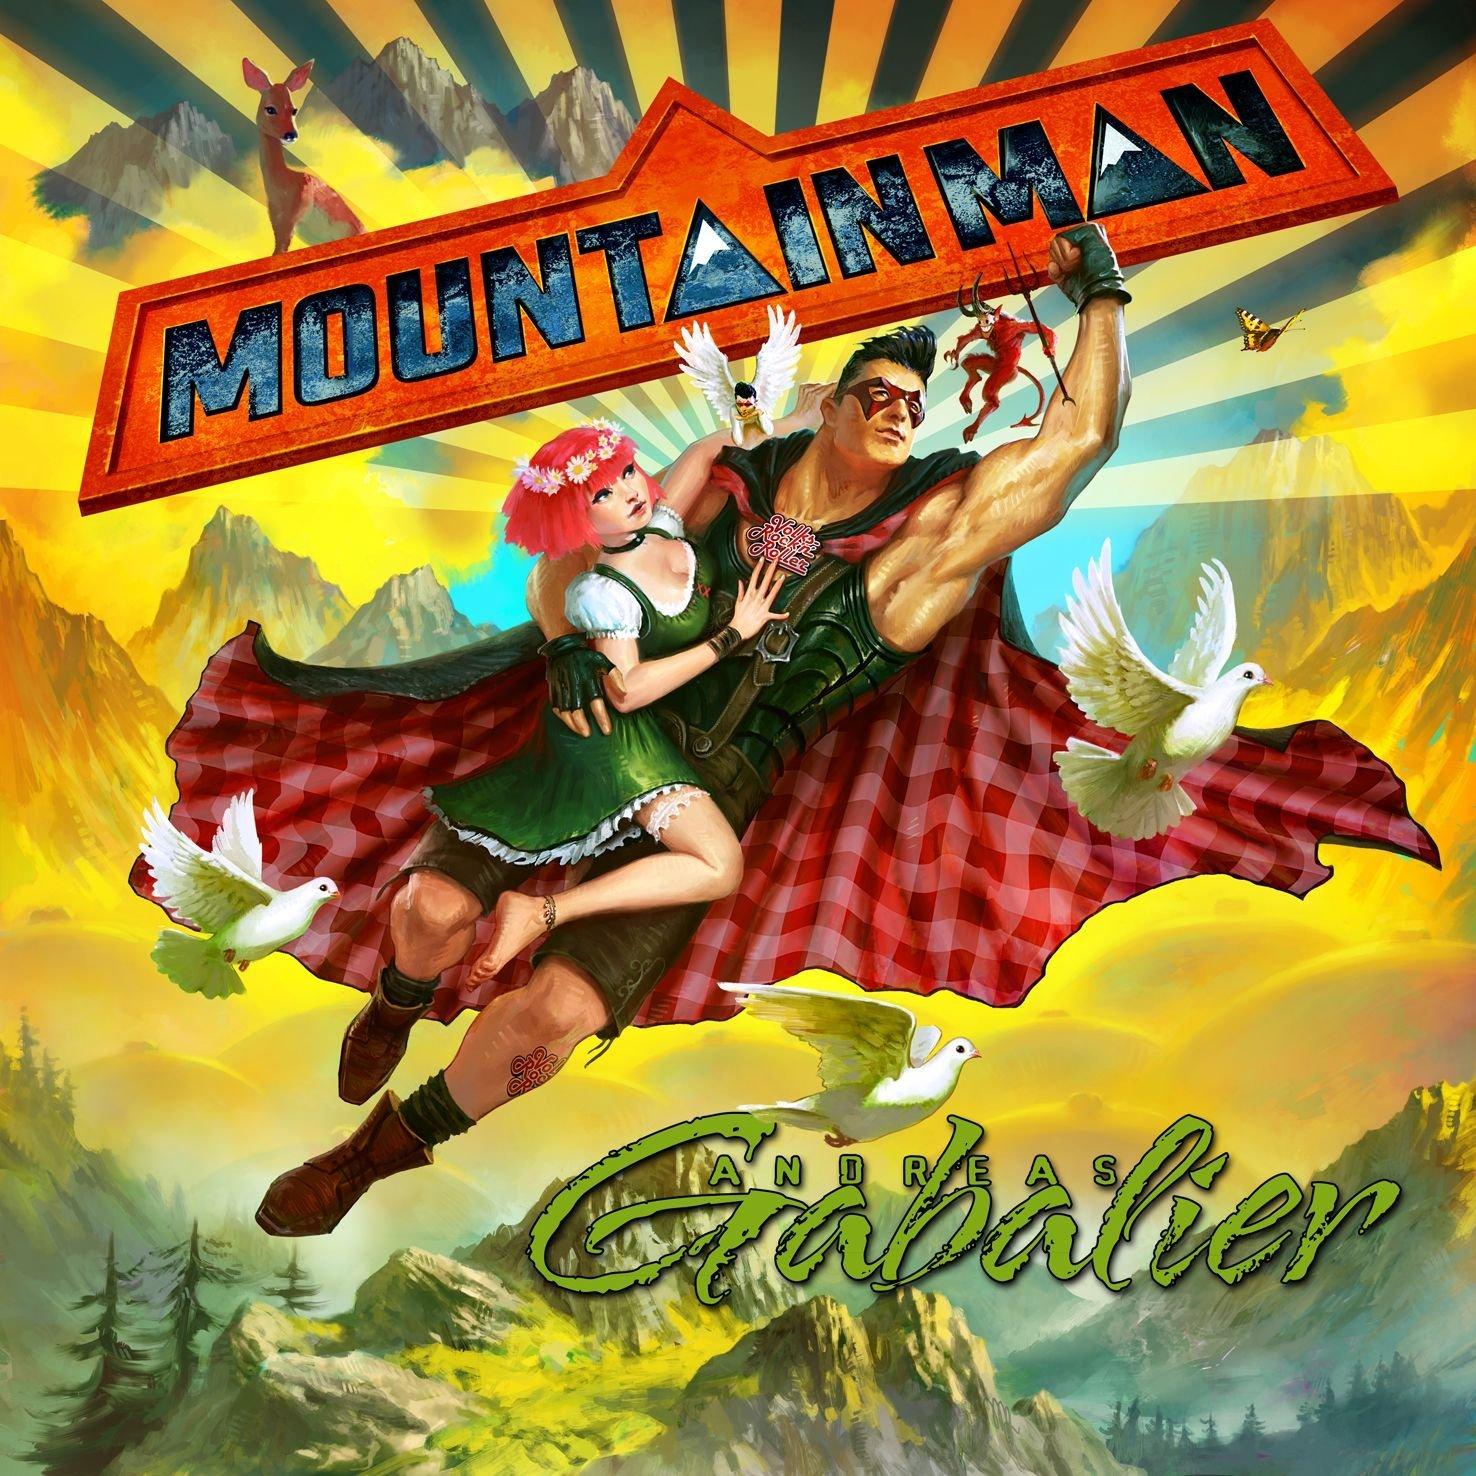 Mountain Man - The New Album from Andreas Gabalier Album Cover